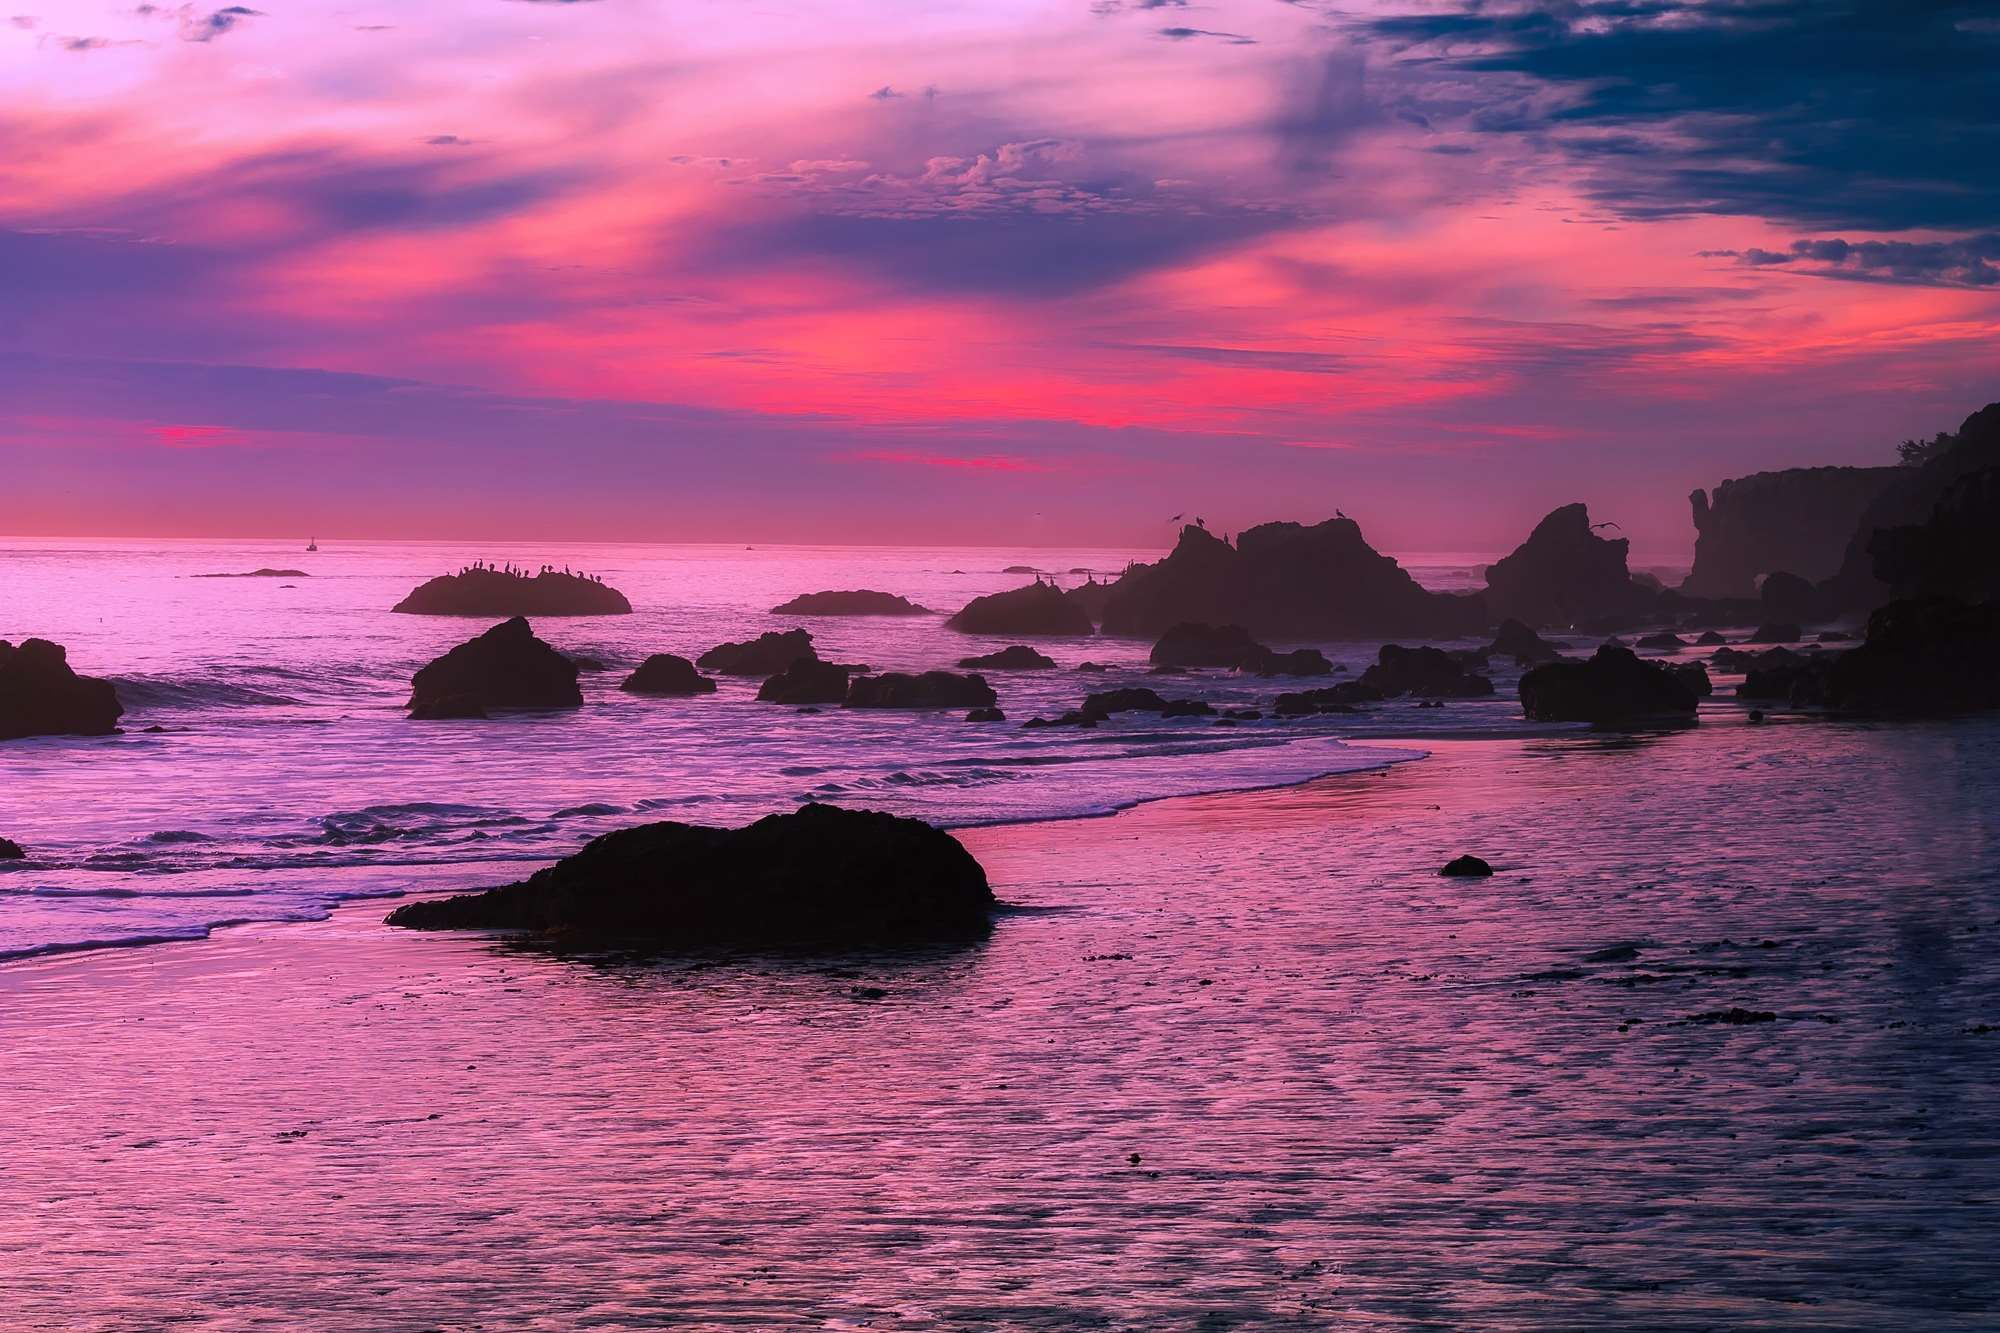 Beautiful Boulders California Clouds Colorful Colors Dusk Formations Hdr Malibu Nature Ocean Outcrop Long Weekend Trips California Sunset Dusk Sky Sunset sea pink clouds coast rocks